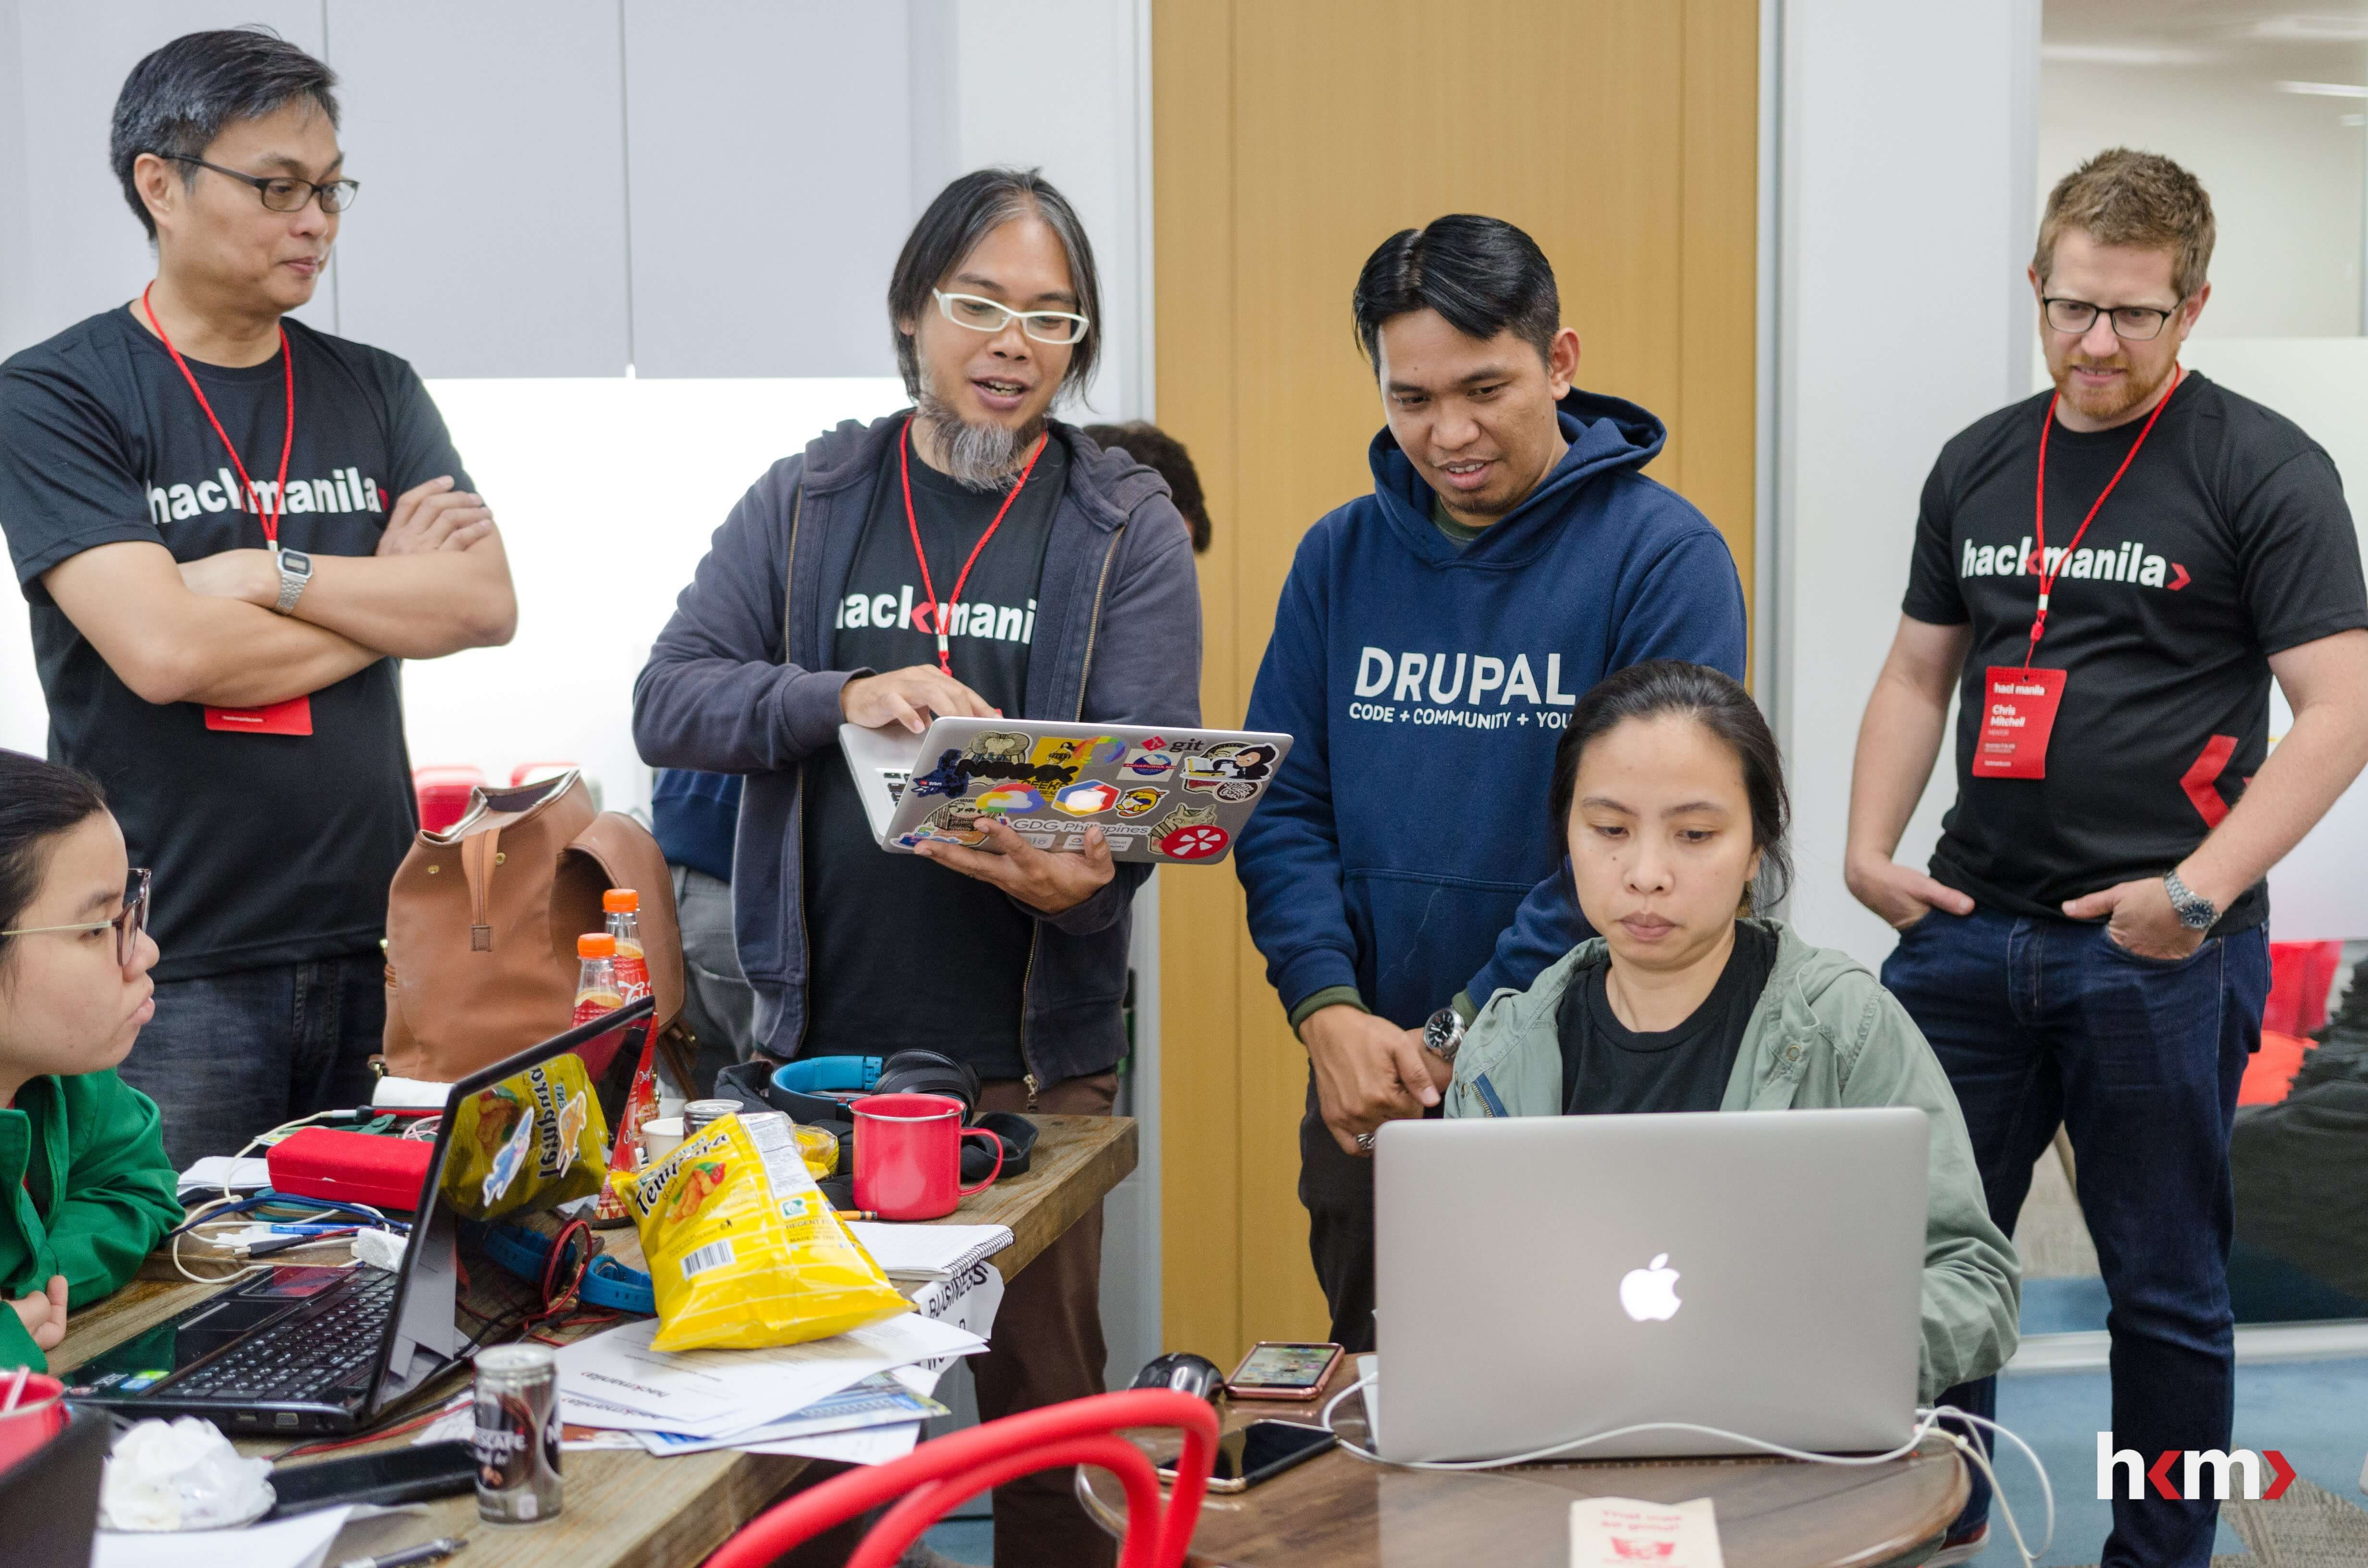 Hack Manila: GDG mentors (Ruben Canlas and Brian Tan Seng), Team Digify, and Canstar CFO Chris Mitchell